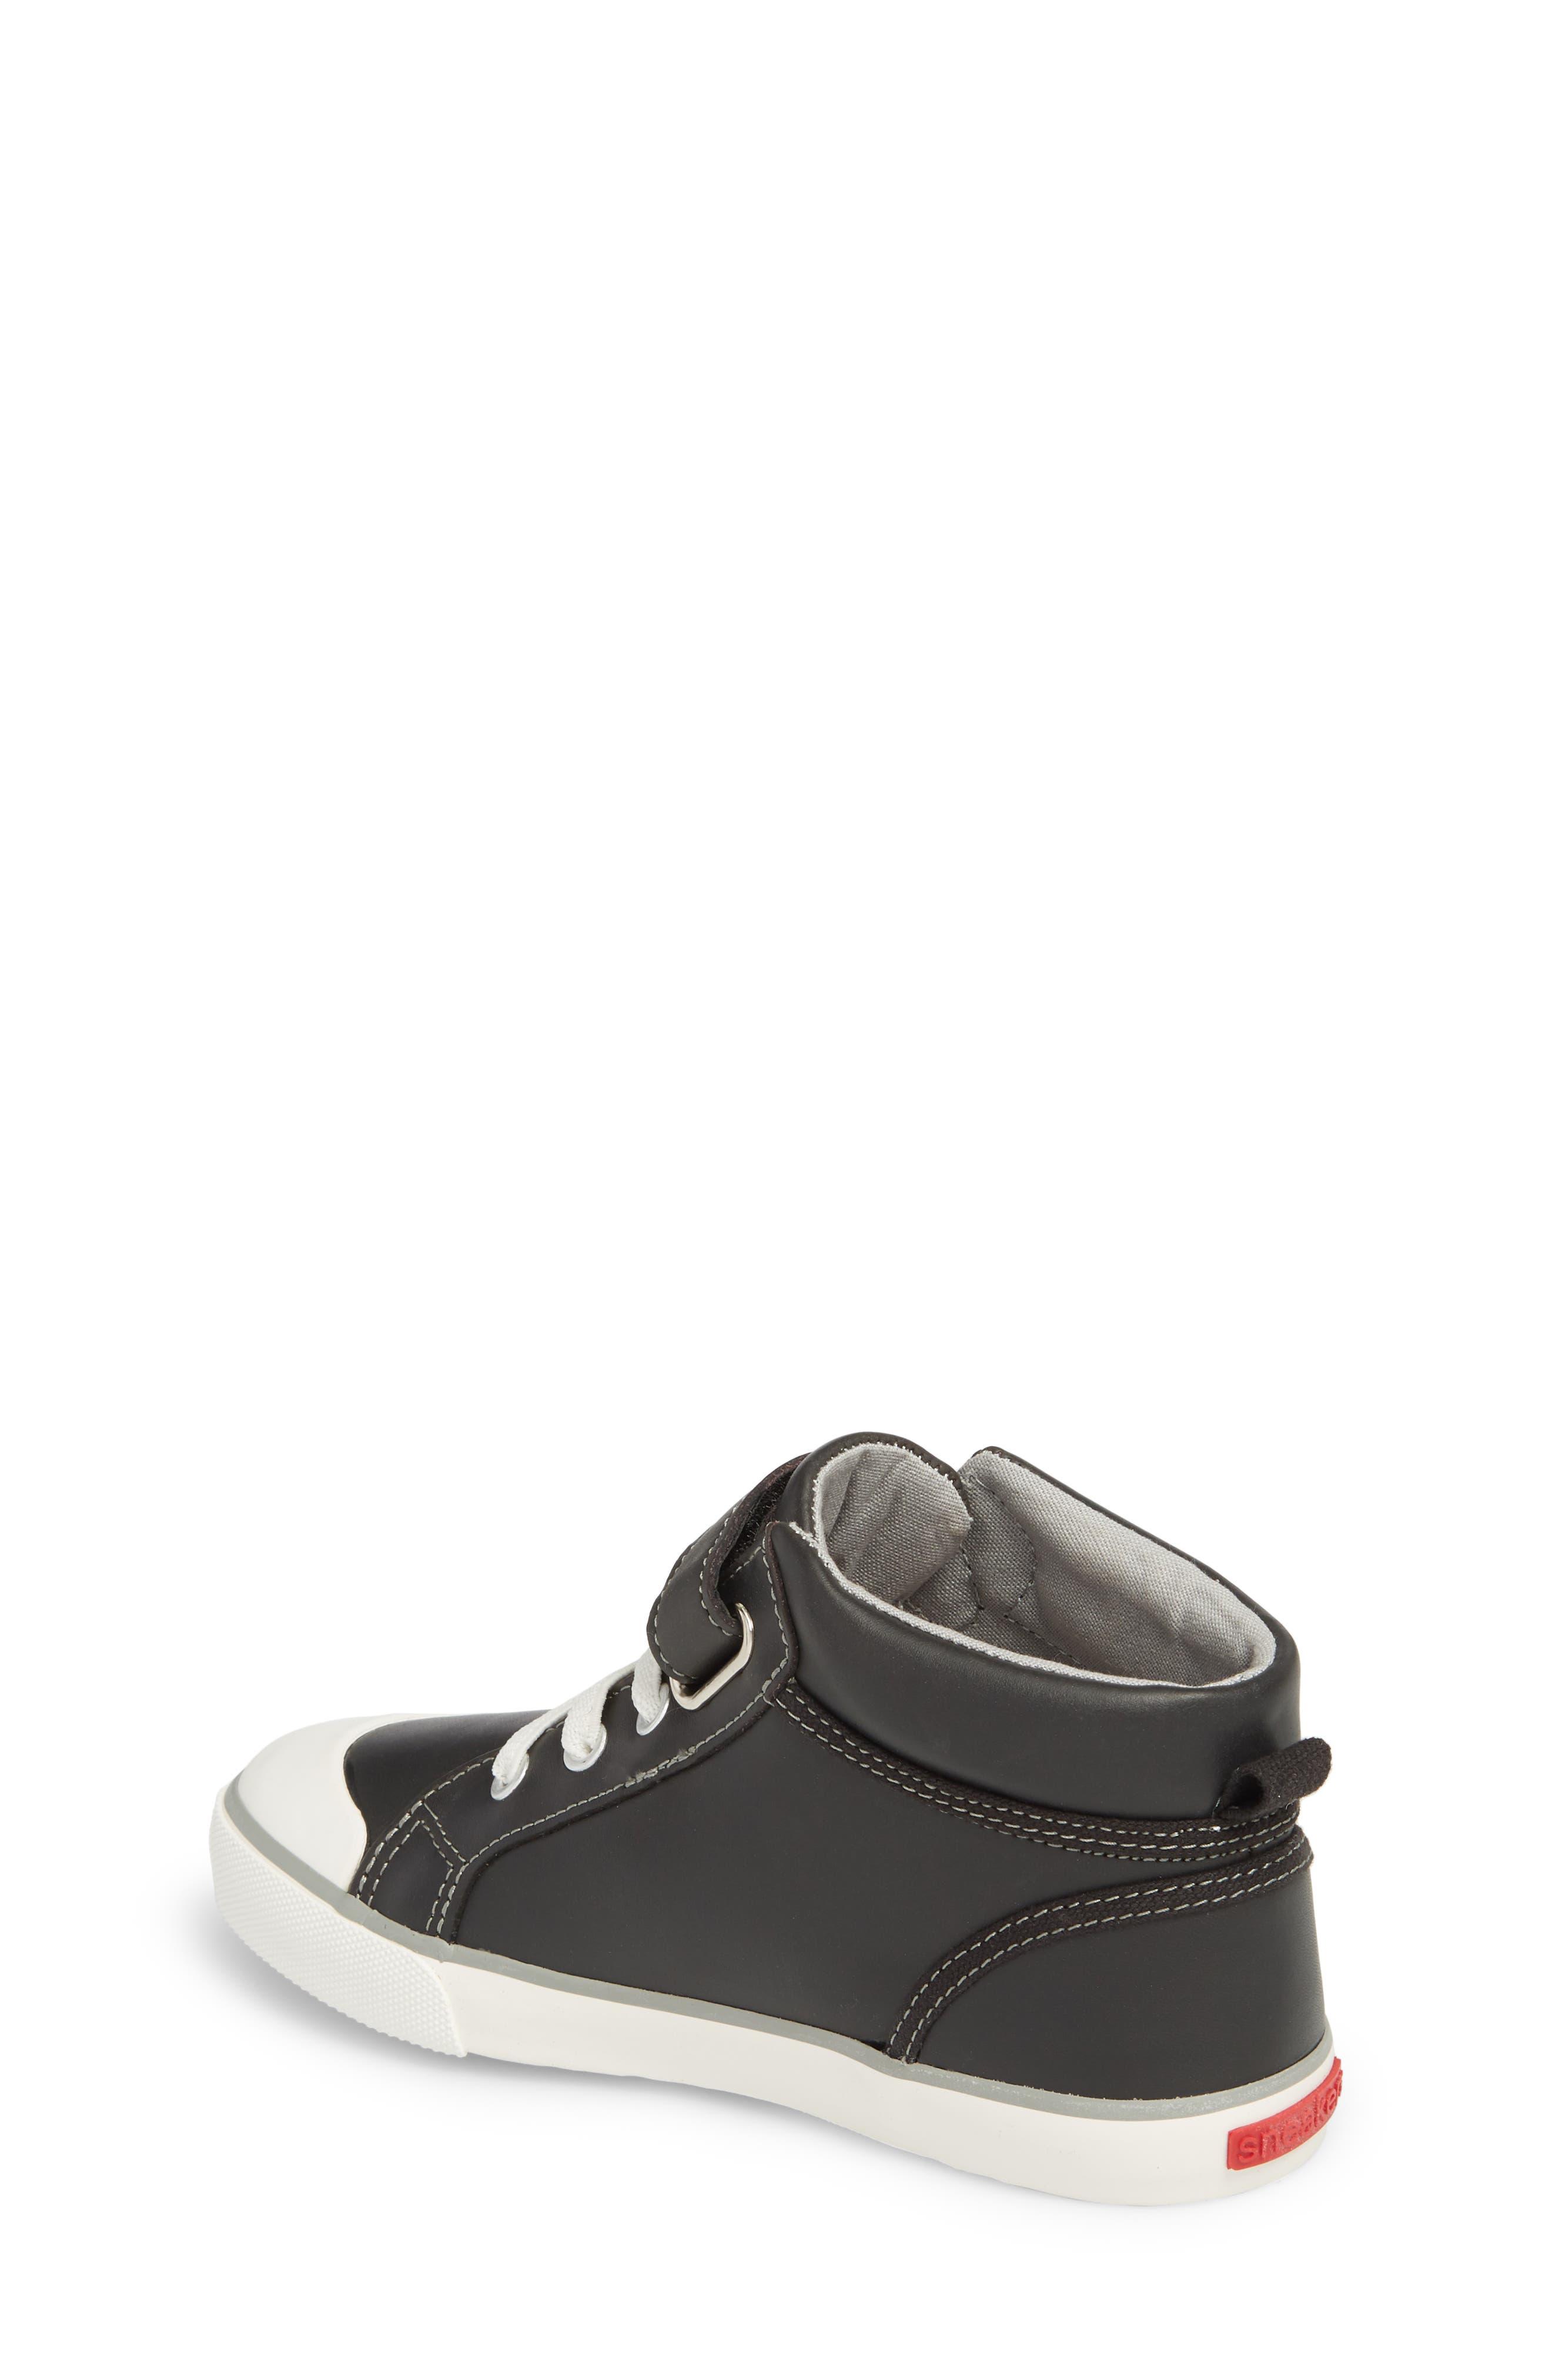 Peyton Metallic Mid Top Sneaker,                             Alternate thumbnail 2, color,                             Black Leather